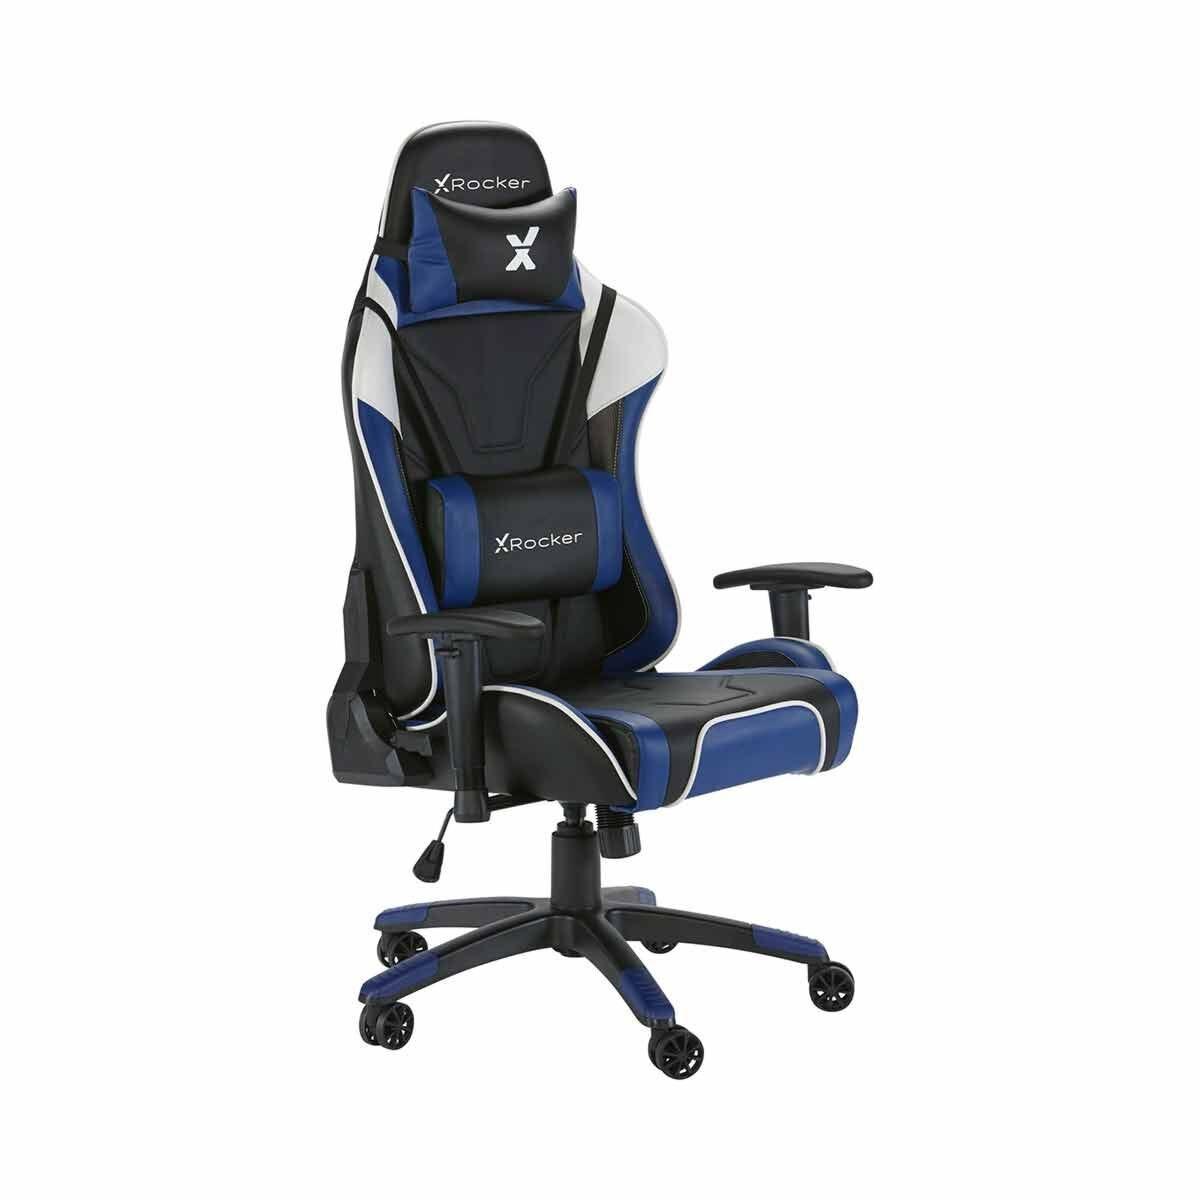 X Rocker Agility eSports Office Gaming Chair Blue